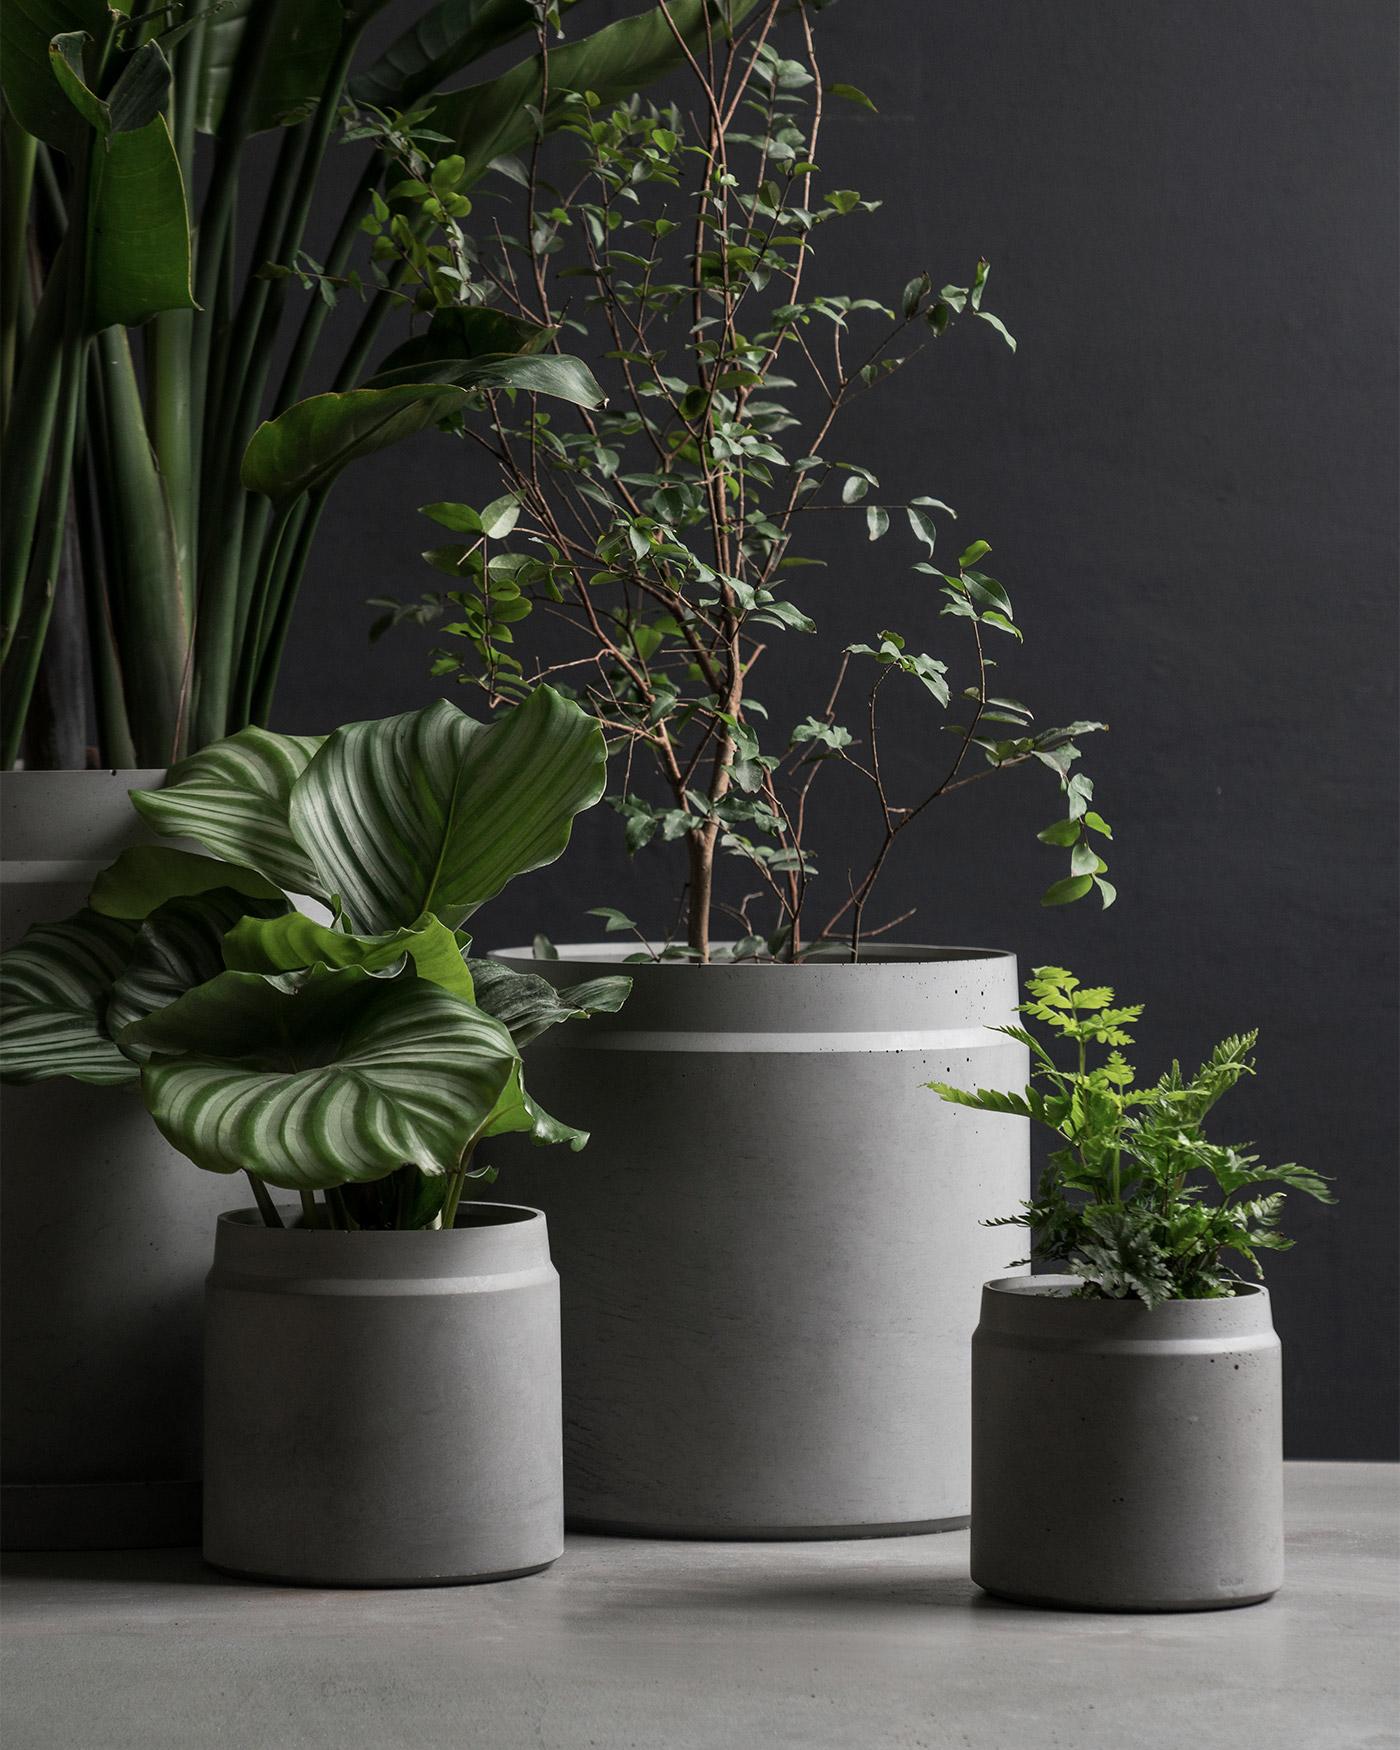 minimal round concrete planters with plants